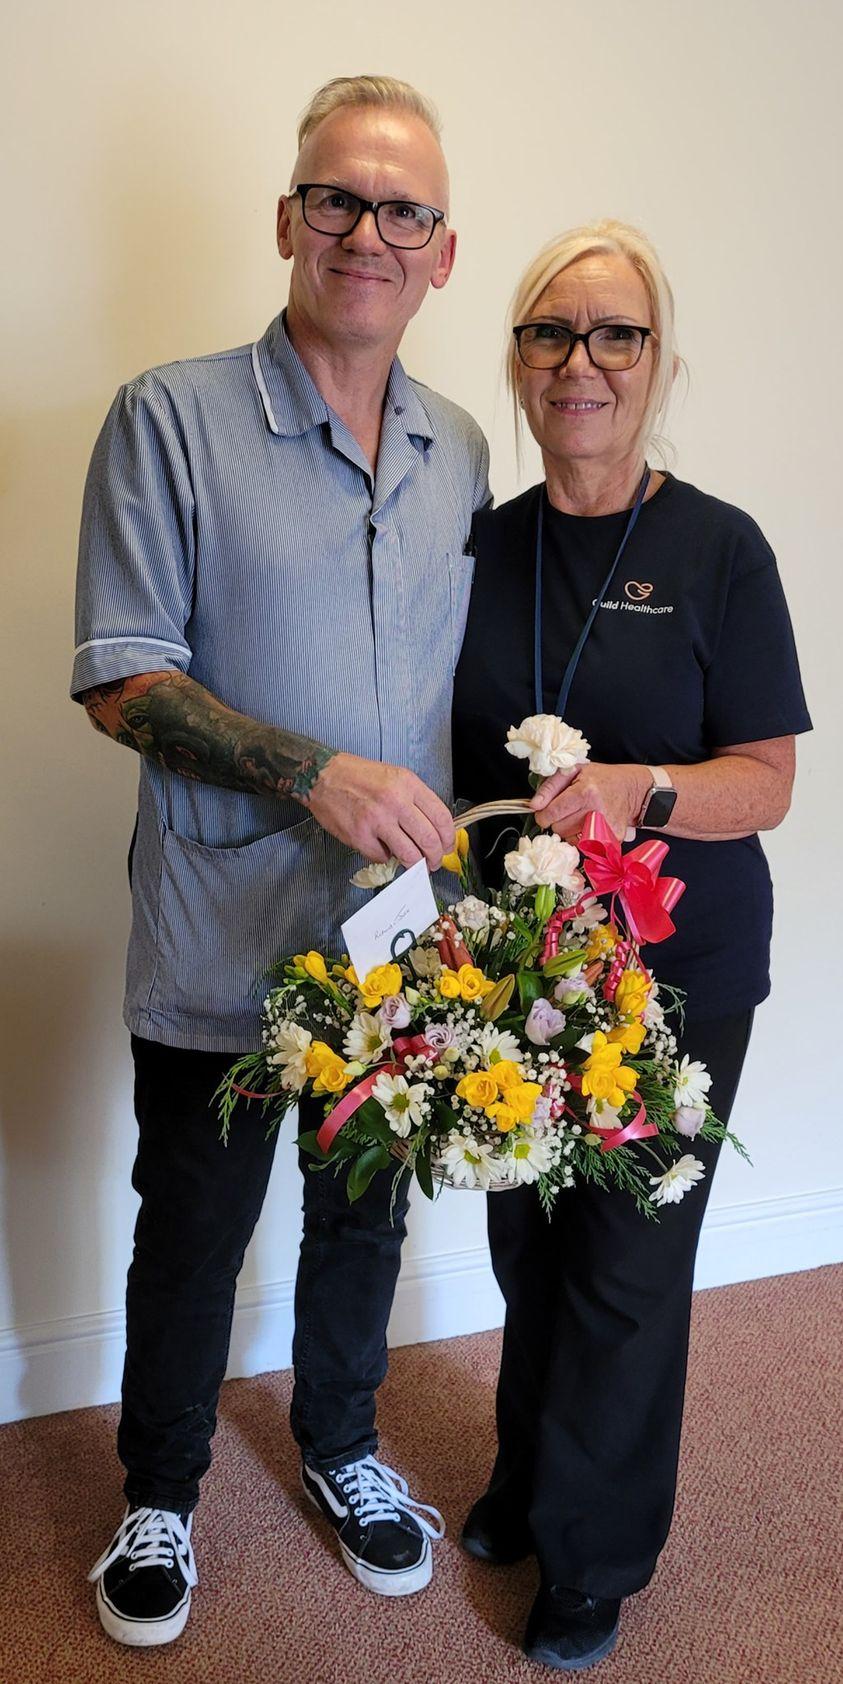 Happy Wedding Anniversary to Richard and Julie! 💍🥰